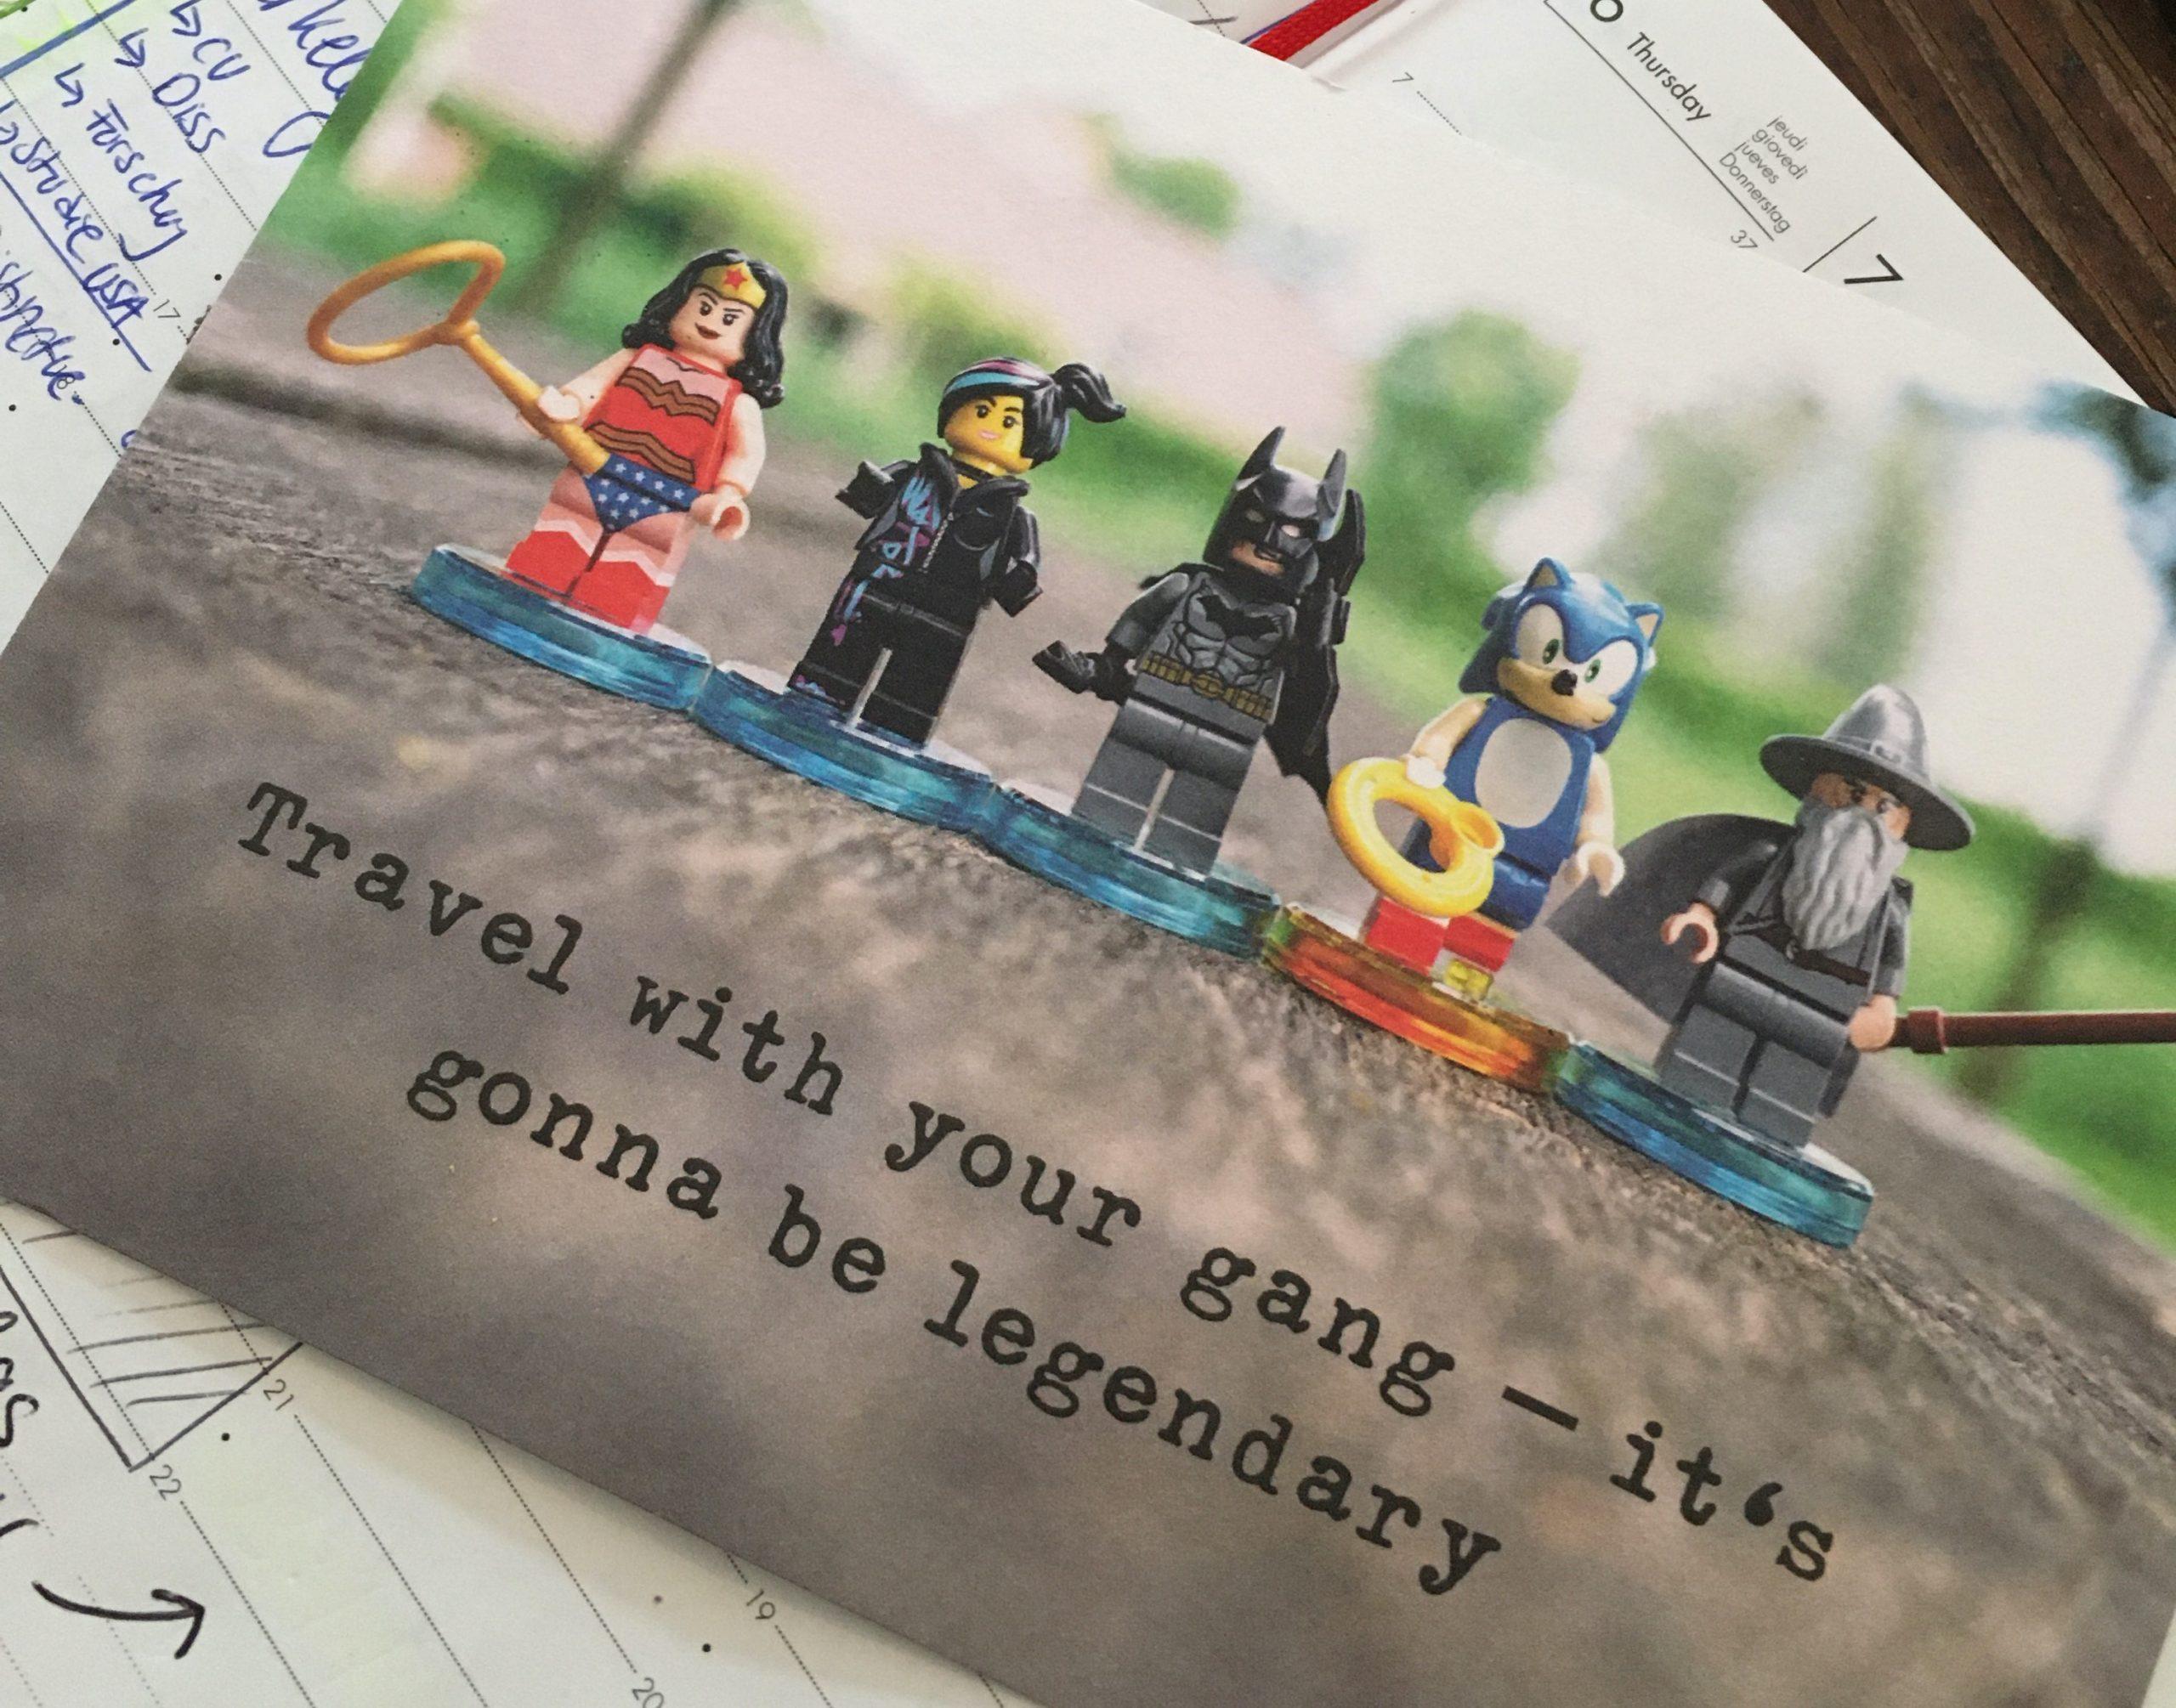 Lego-Superheld:innen